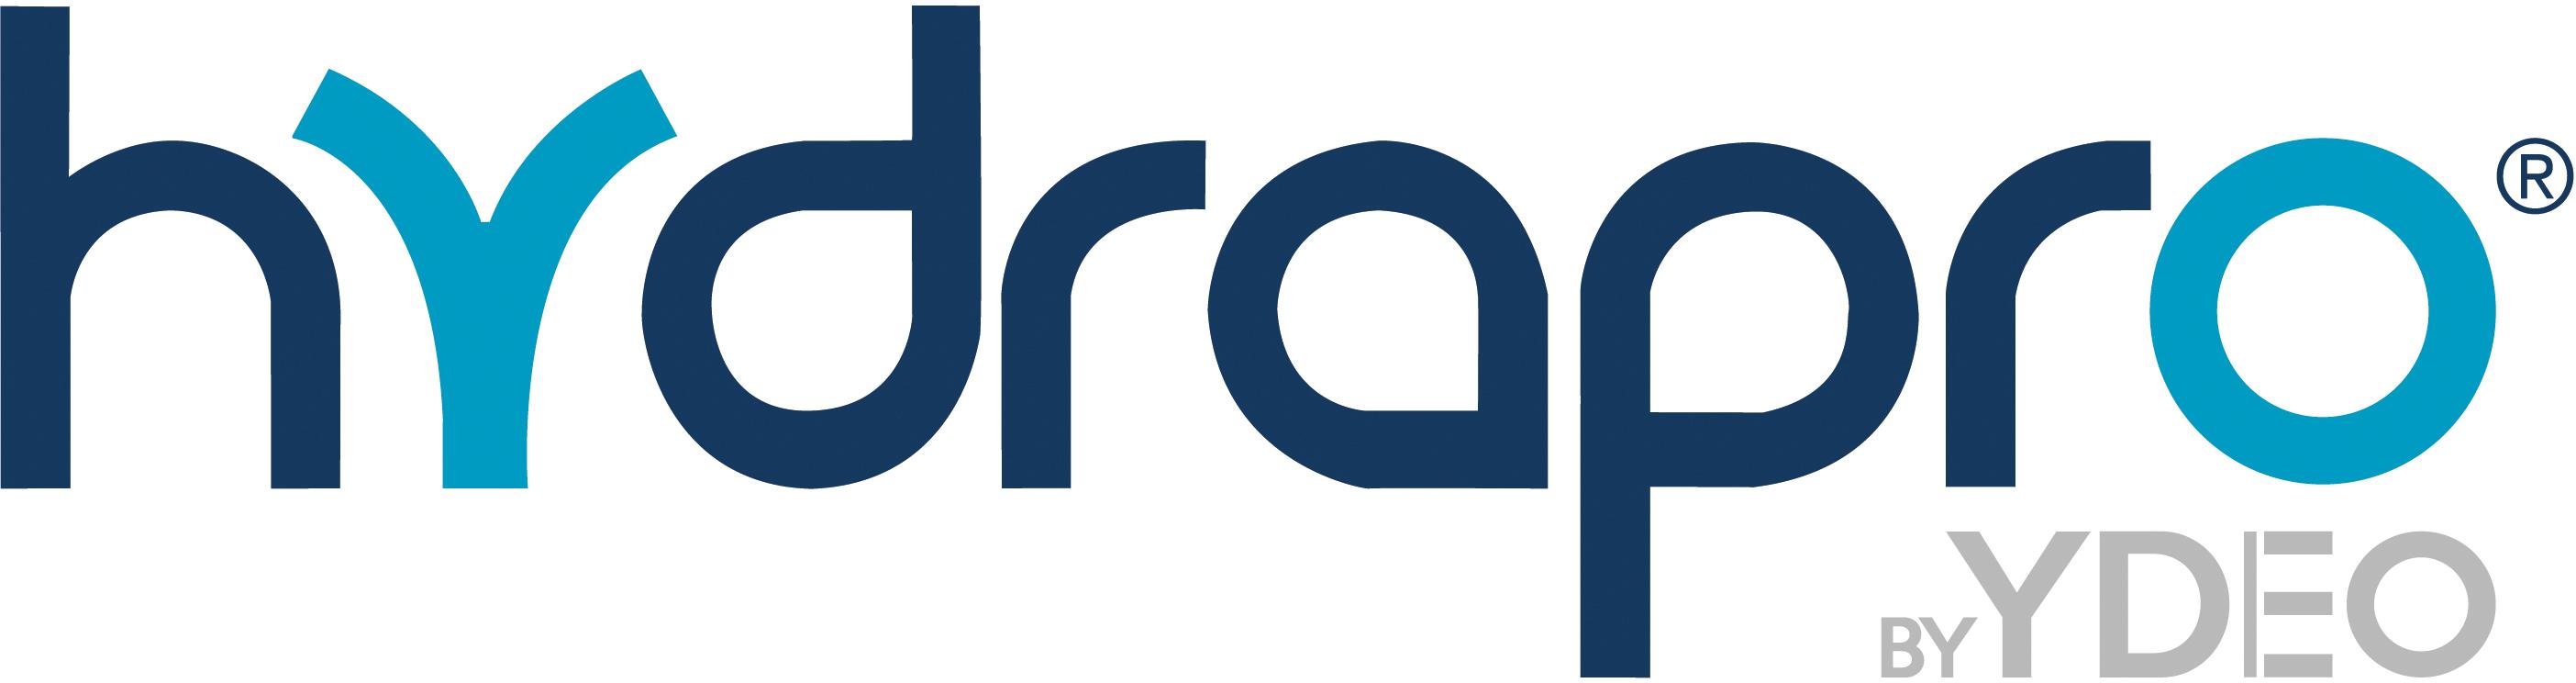 Logo Hydrapro